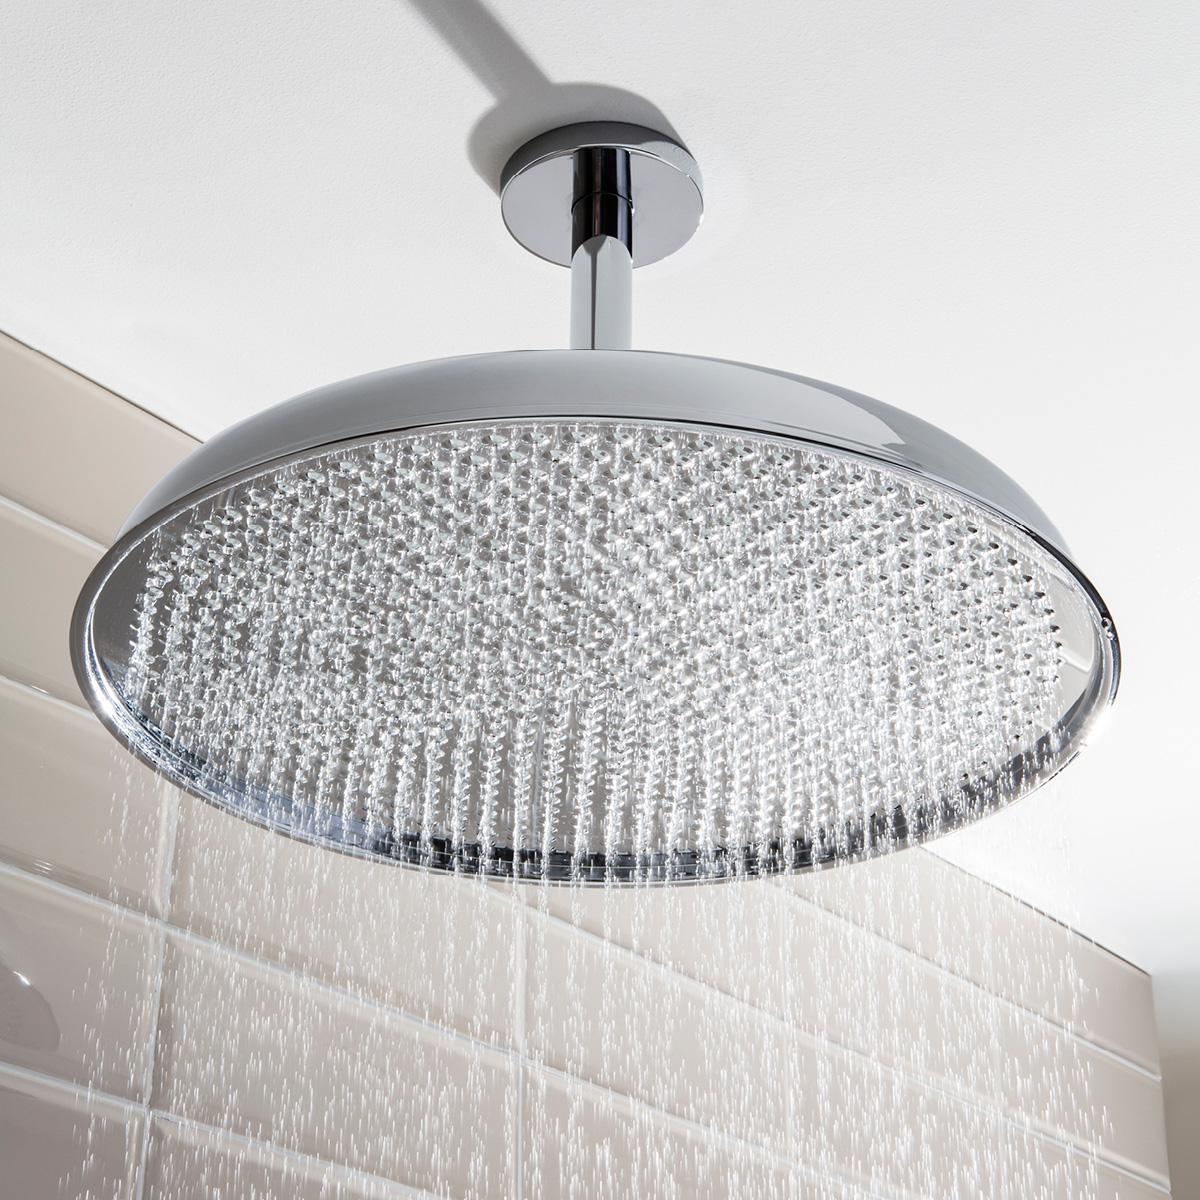 Belgravia 450mm Showerhead In Traditional Luxury